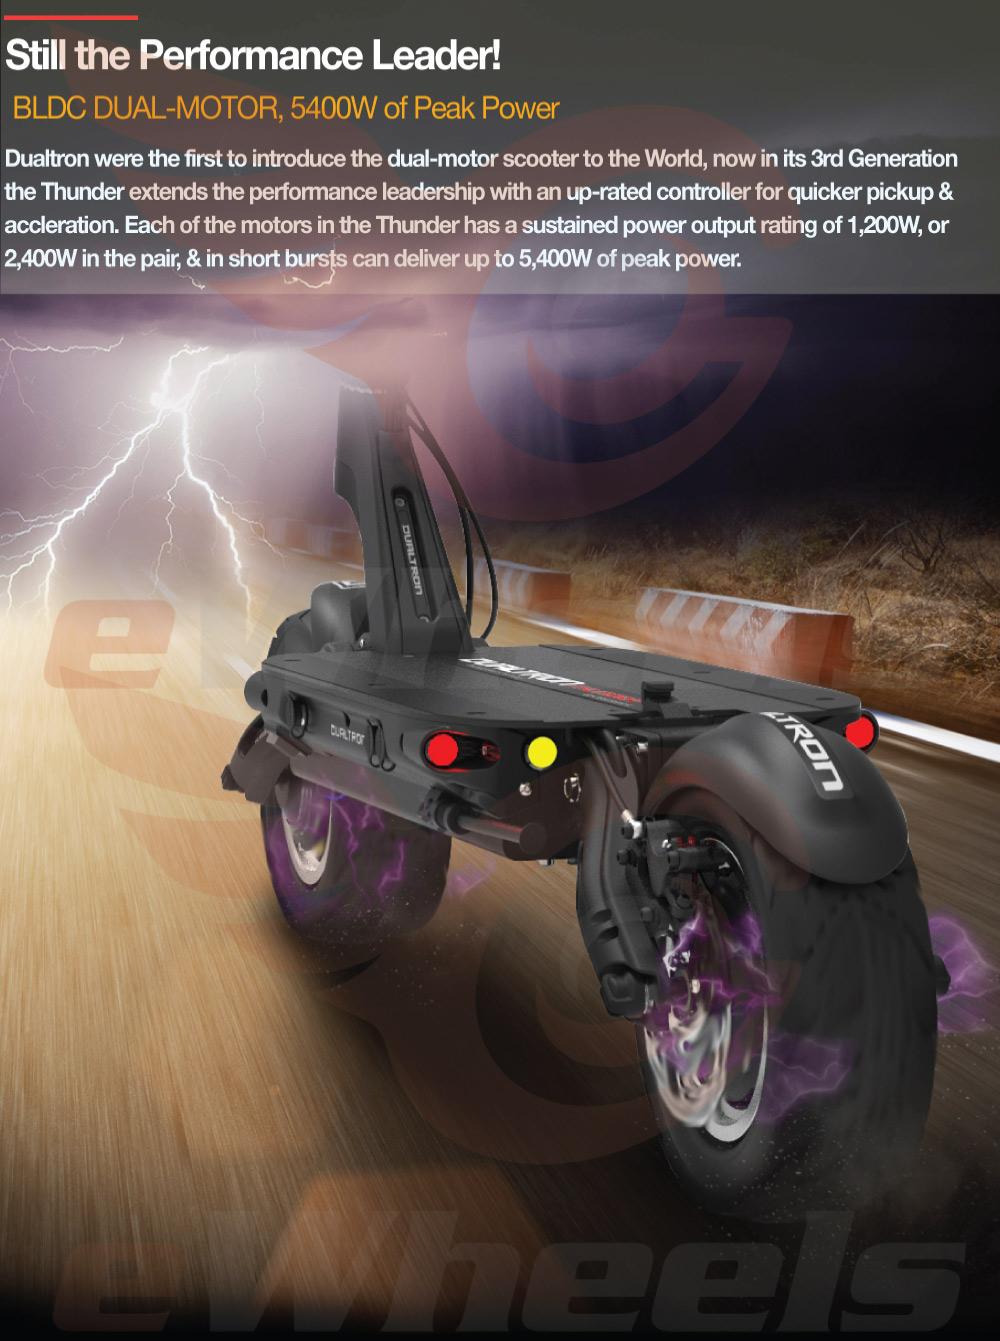 Dualtron Thunder Motor Power Performance